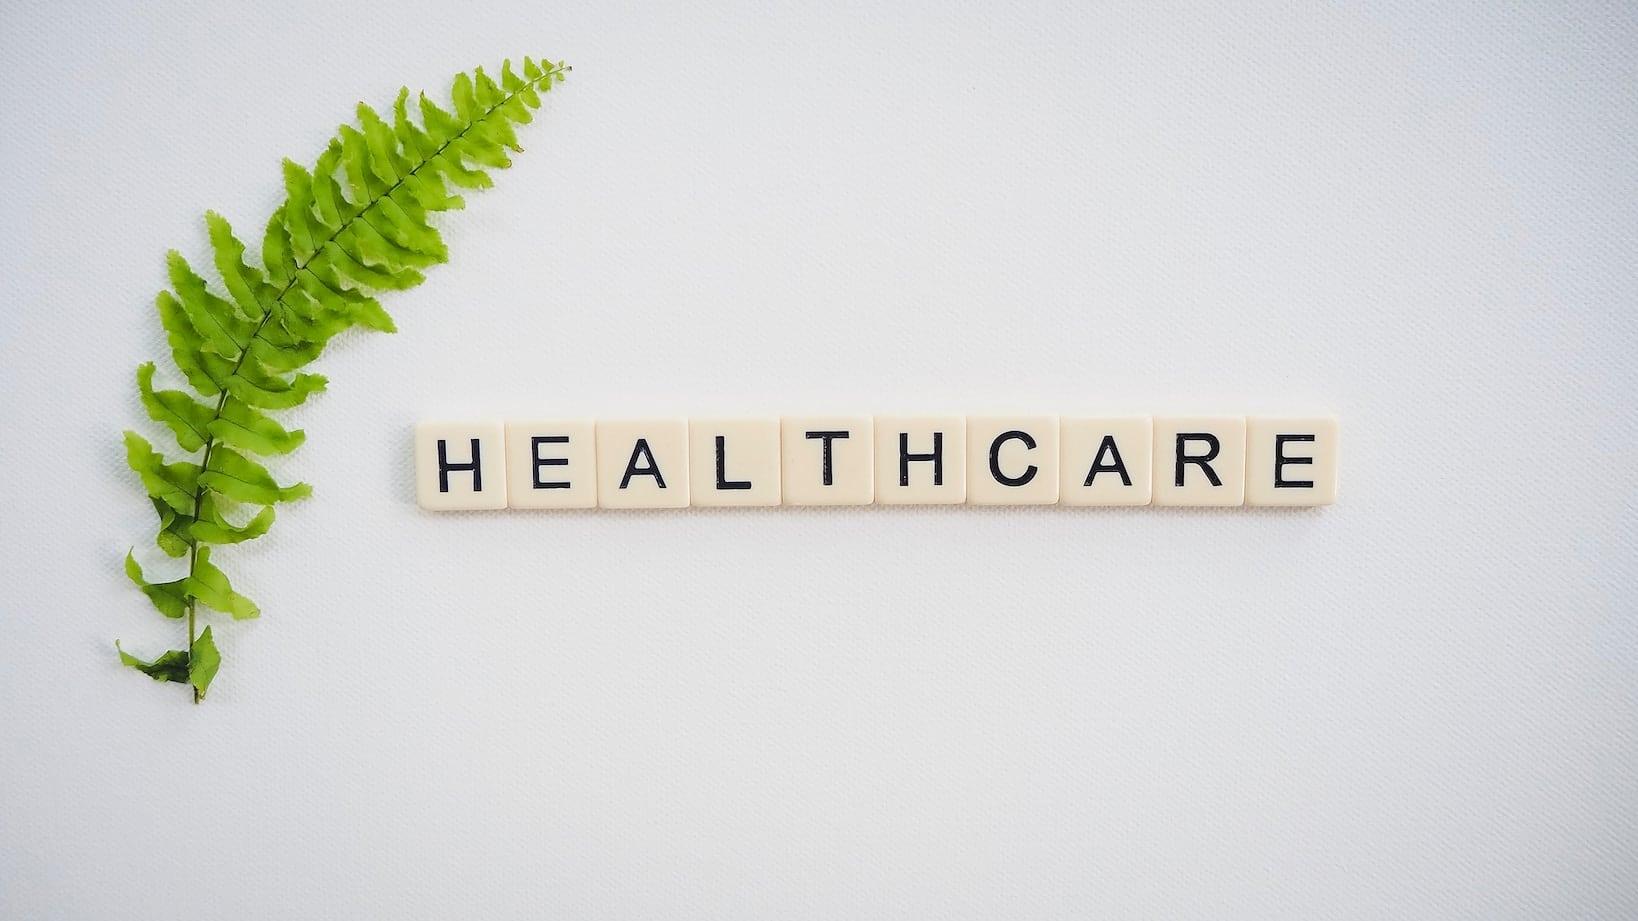 Healthcare Companies & MSSPs: Achieve Your Goals